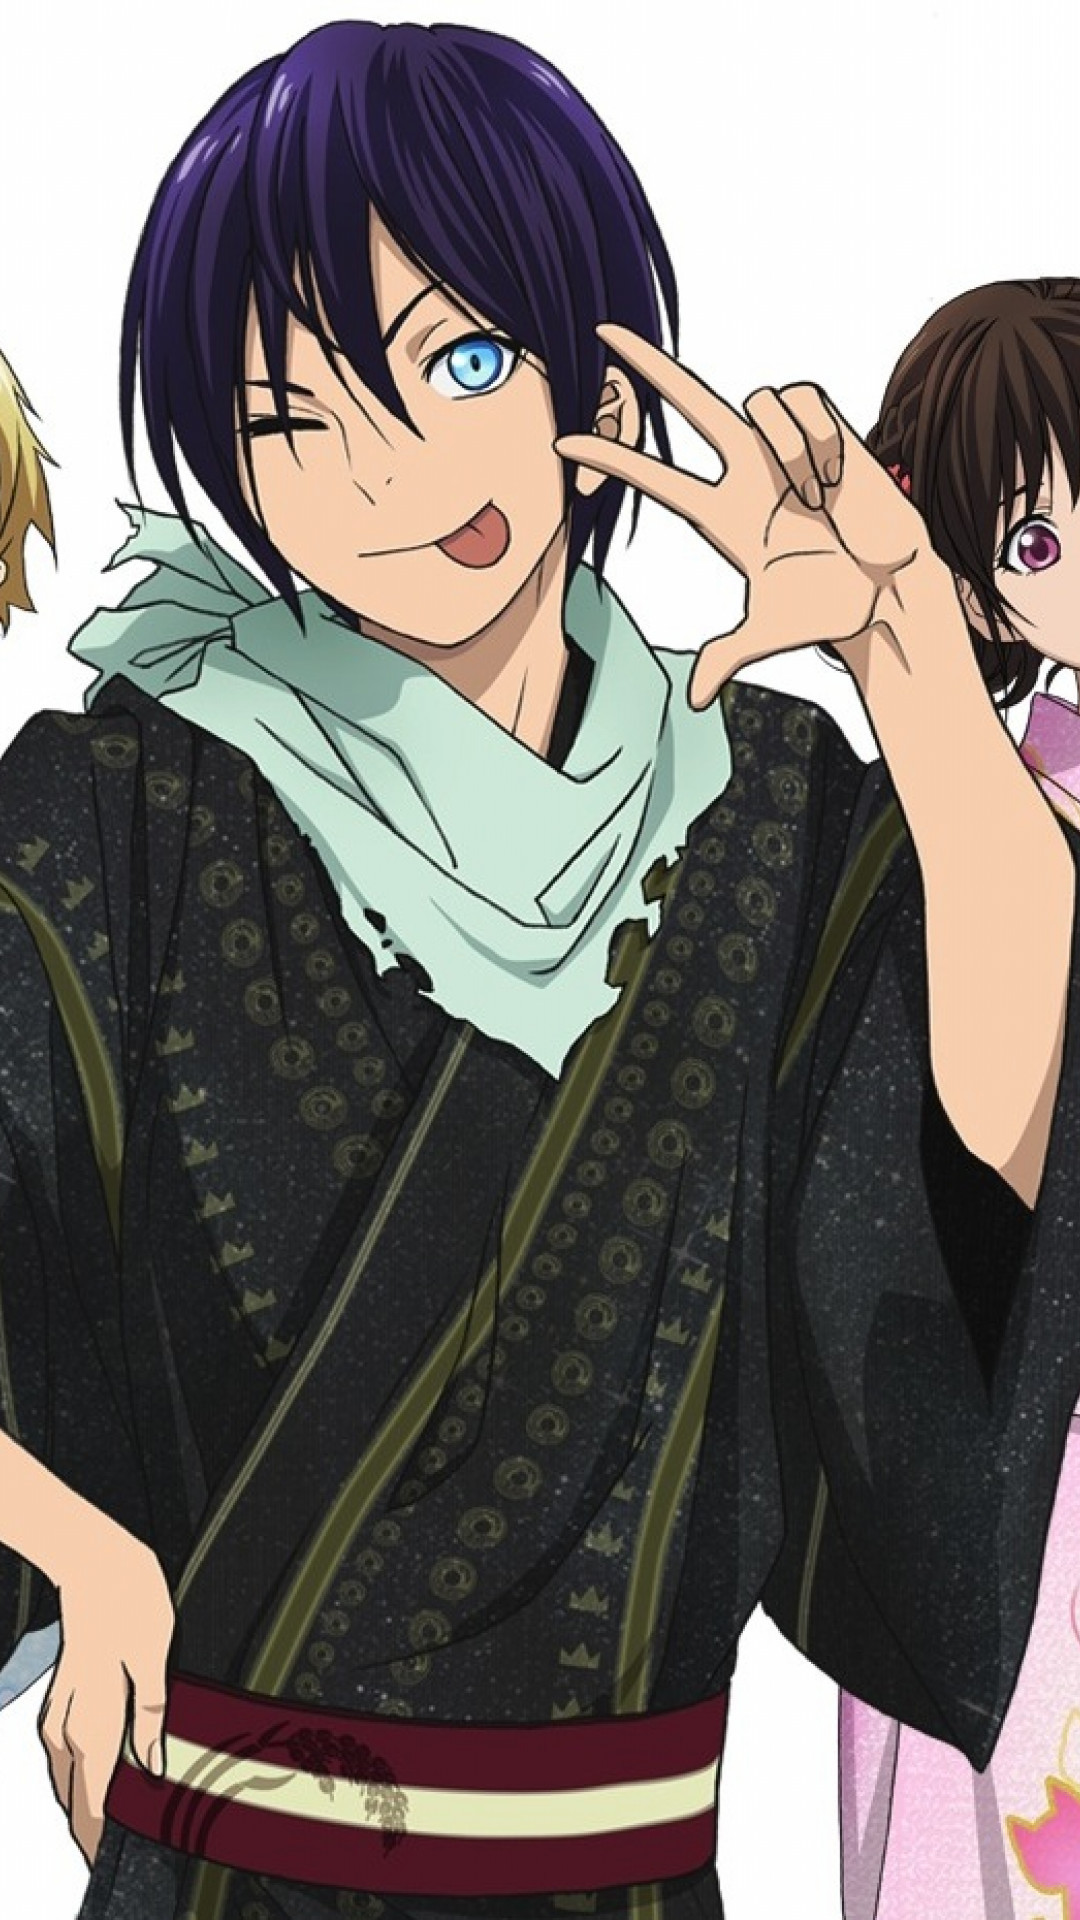 HD Wallapaper Anime Noragami